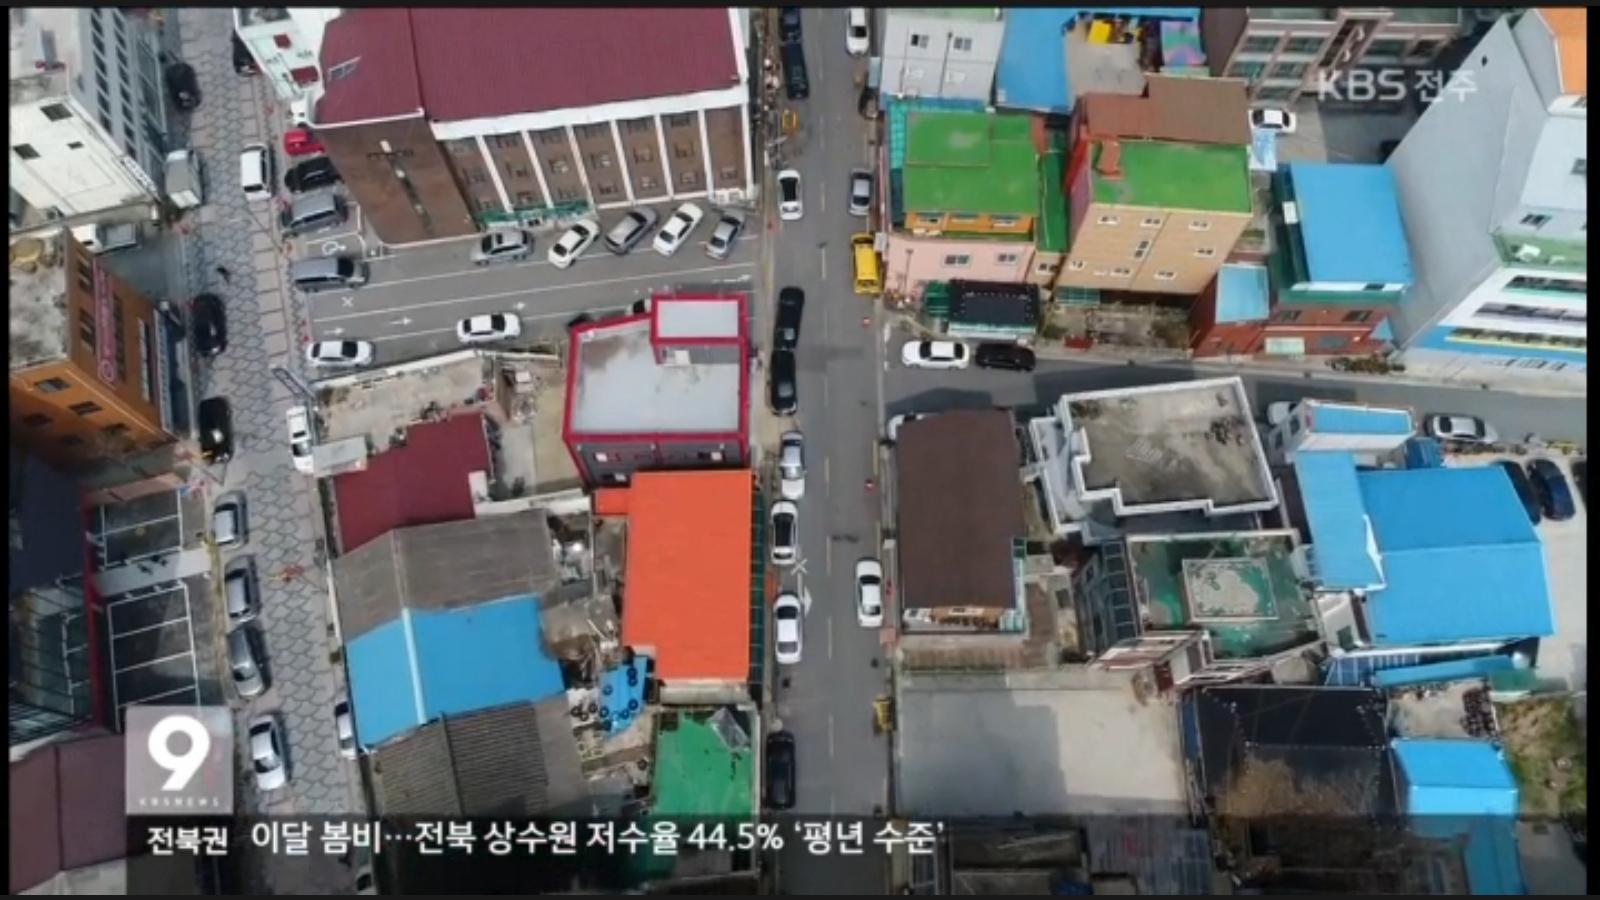 [18.3.30 KBS전주] 전주 봉침게이트, 재산 형성은..후원금검찰 사건축소..재수사 해야4.jpg